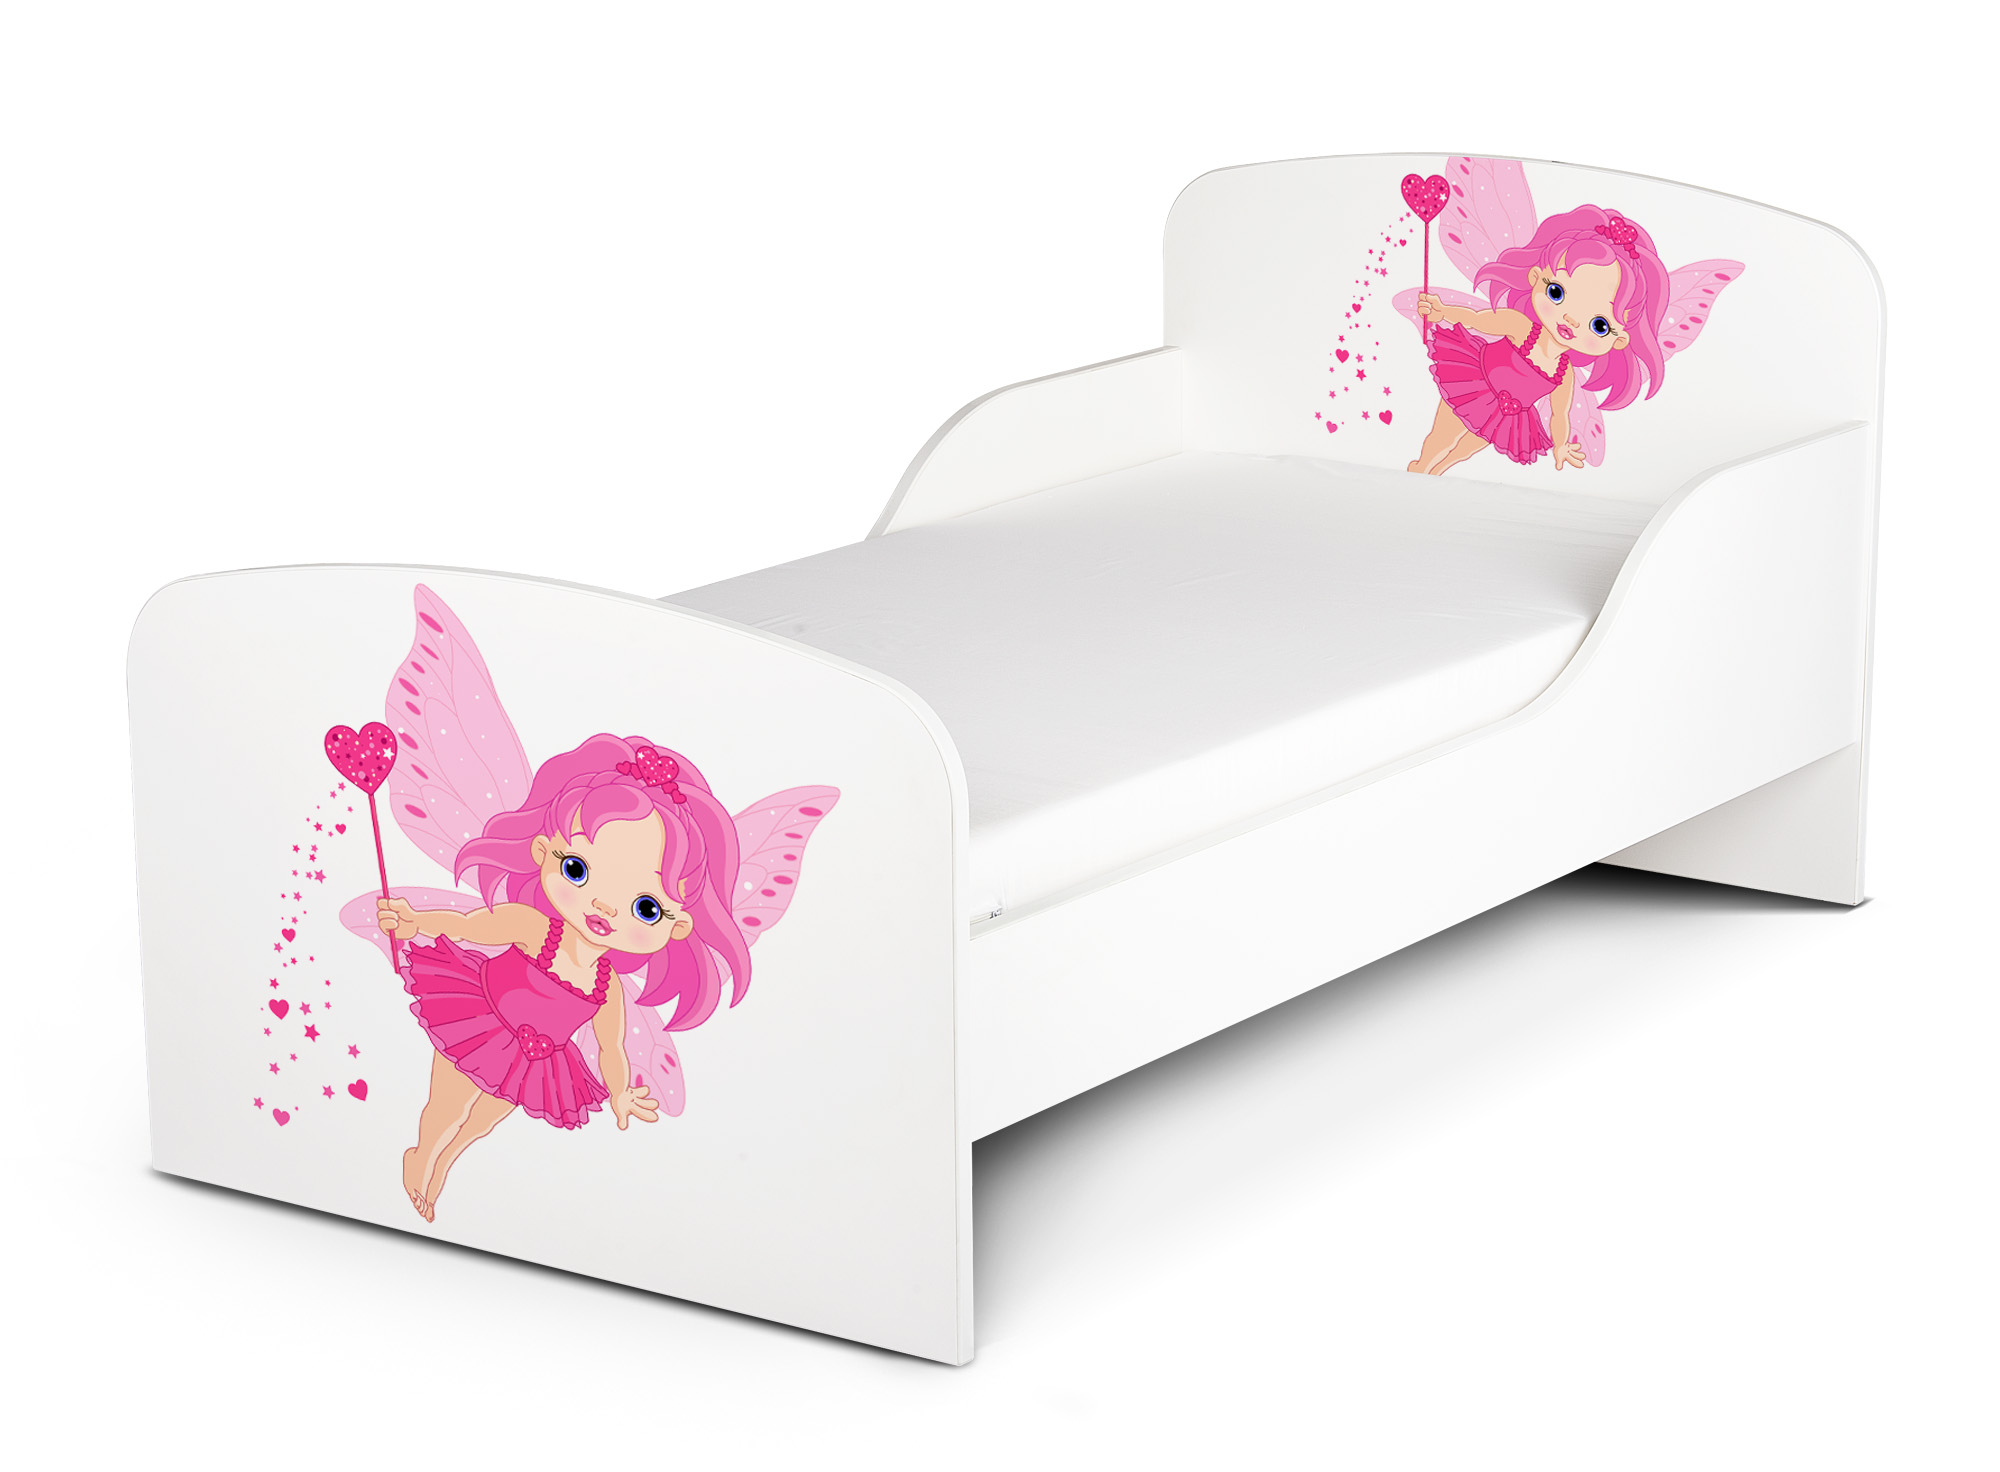 kinderbett 140x70 cm mit matratze thema gute fee. Black Bedroom Furniture Sets. Home Design Ideas